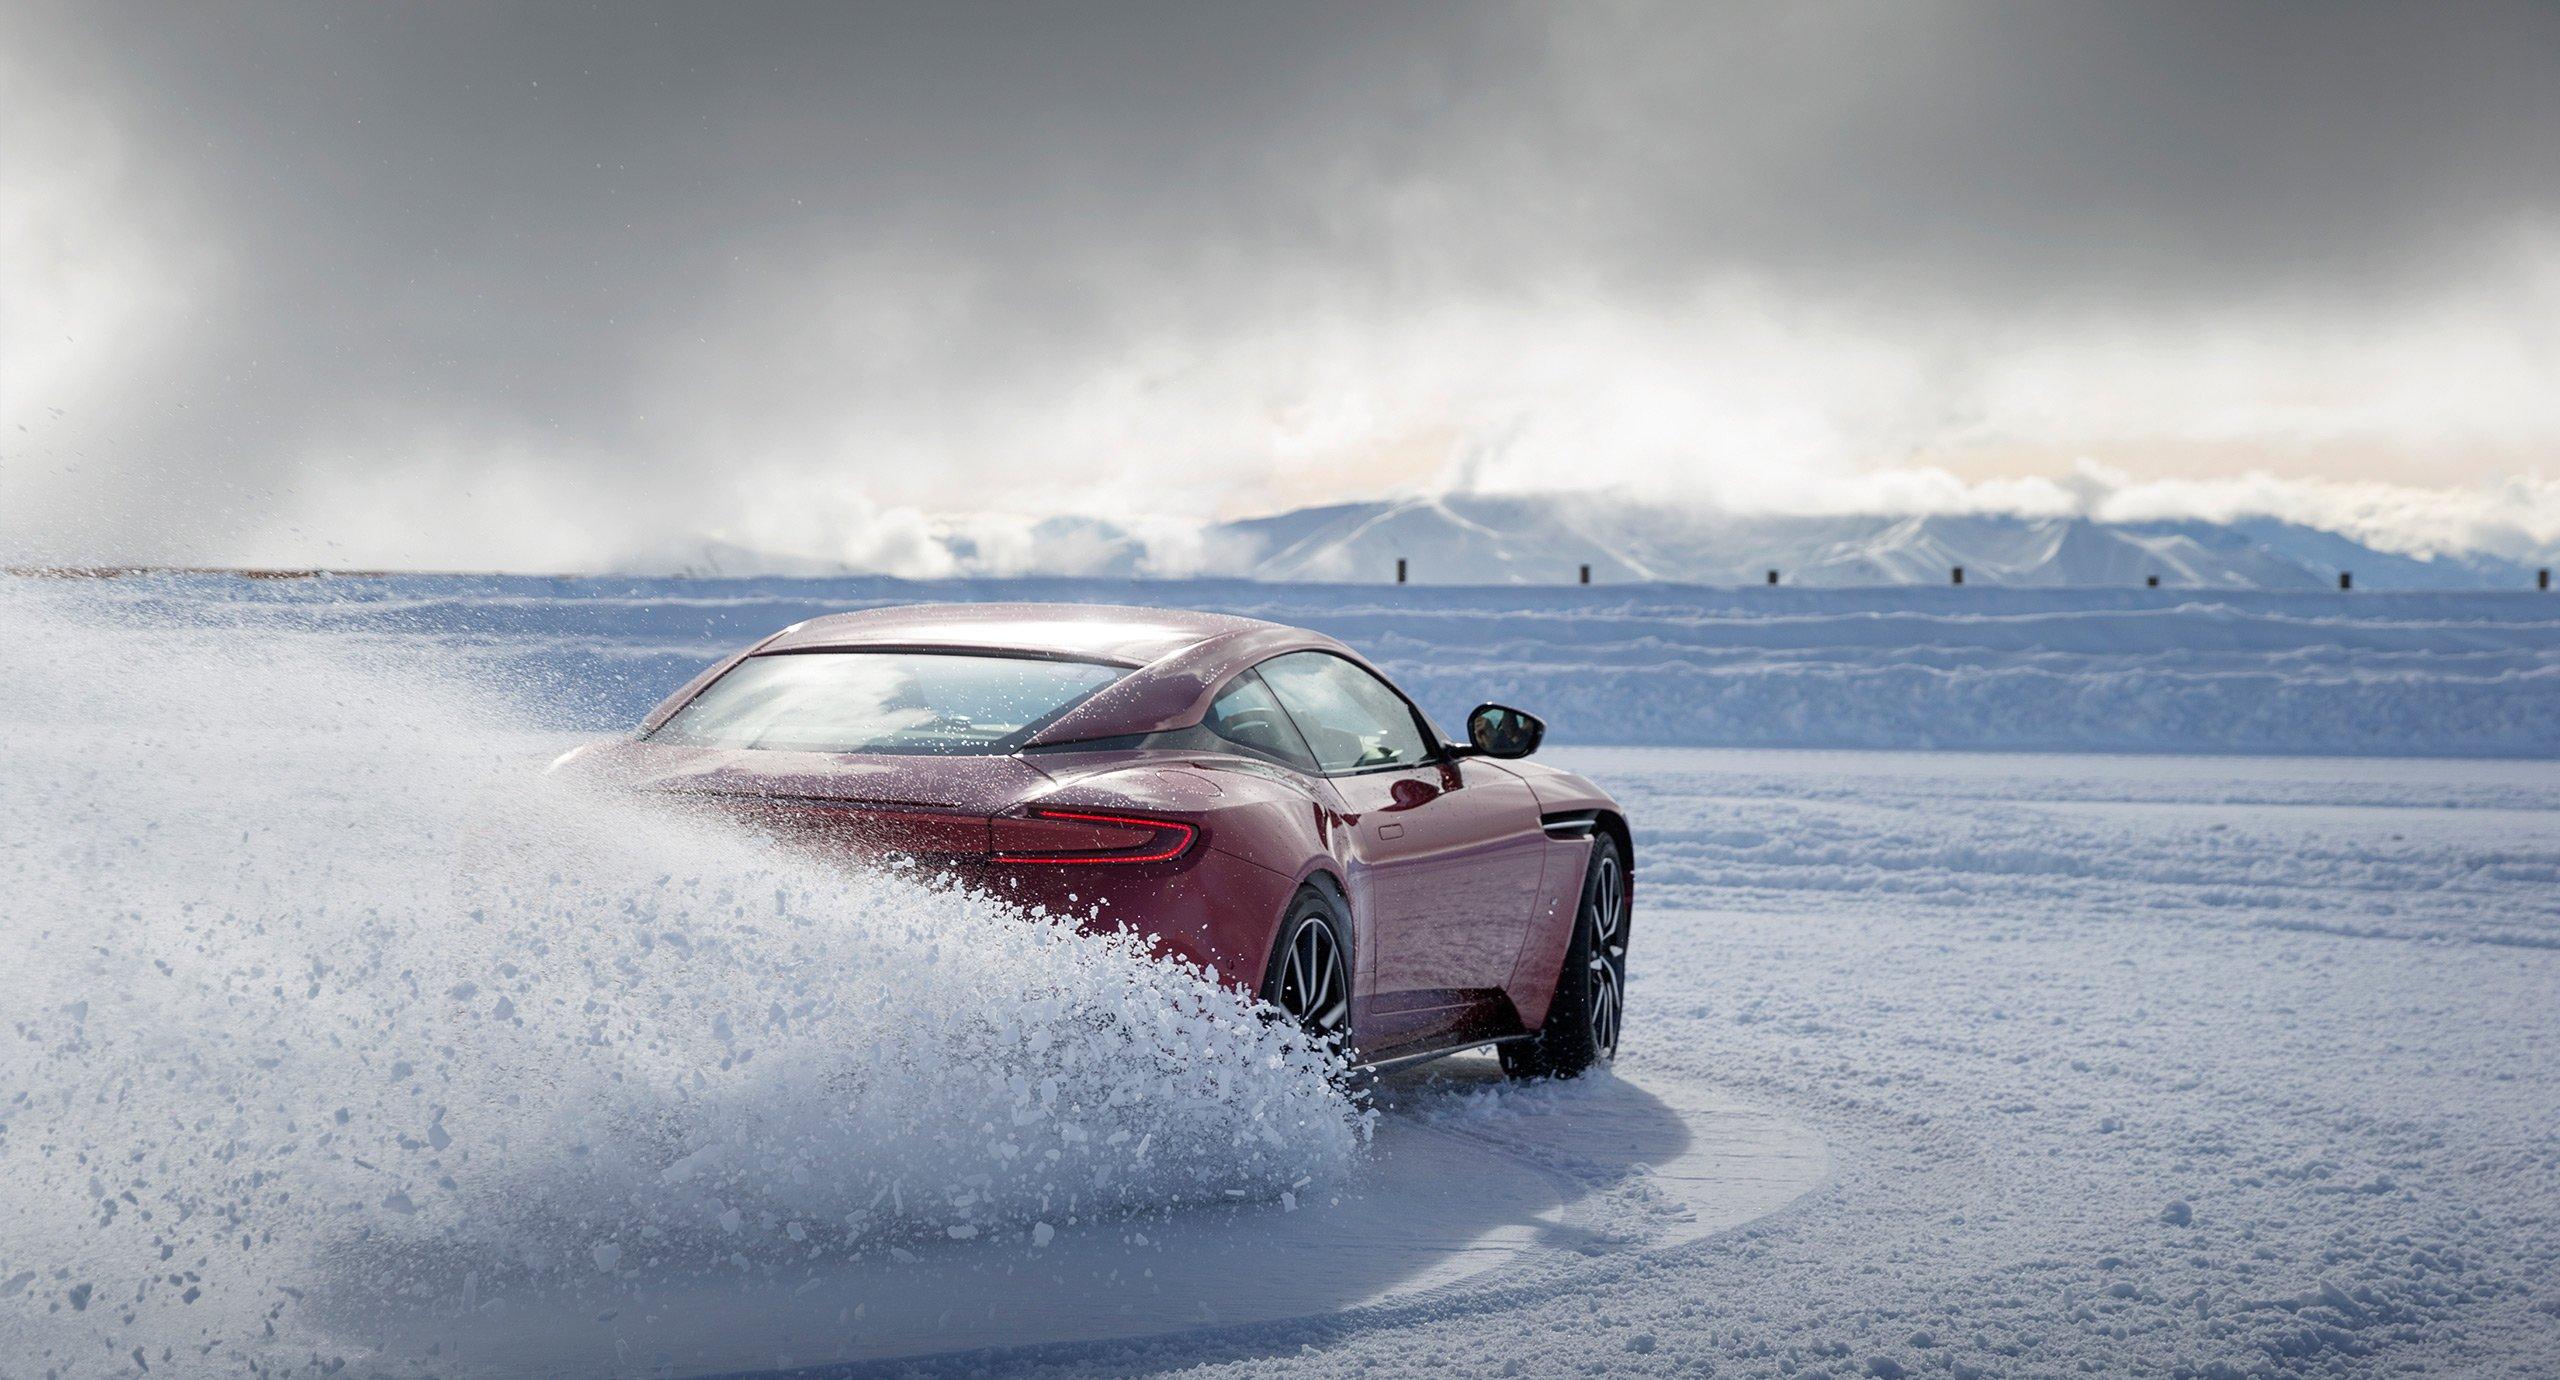 Aston Marton on Ice New Zealand 2017 - Ultimate experience